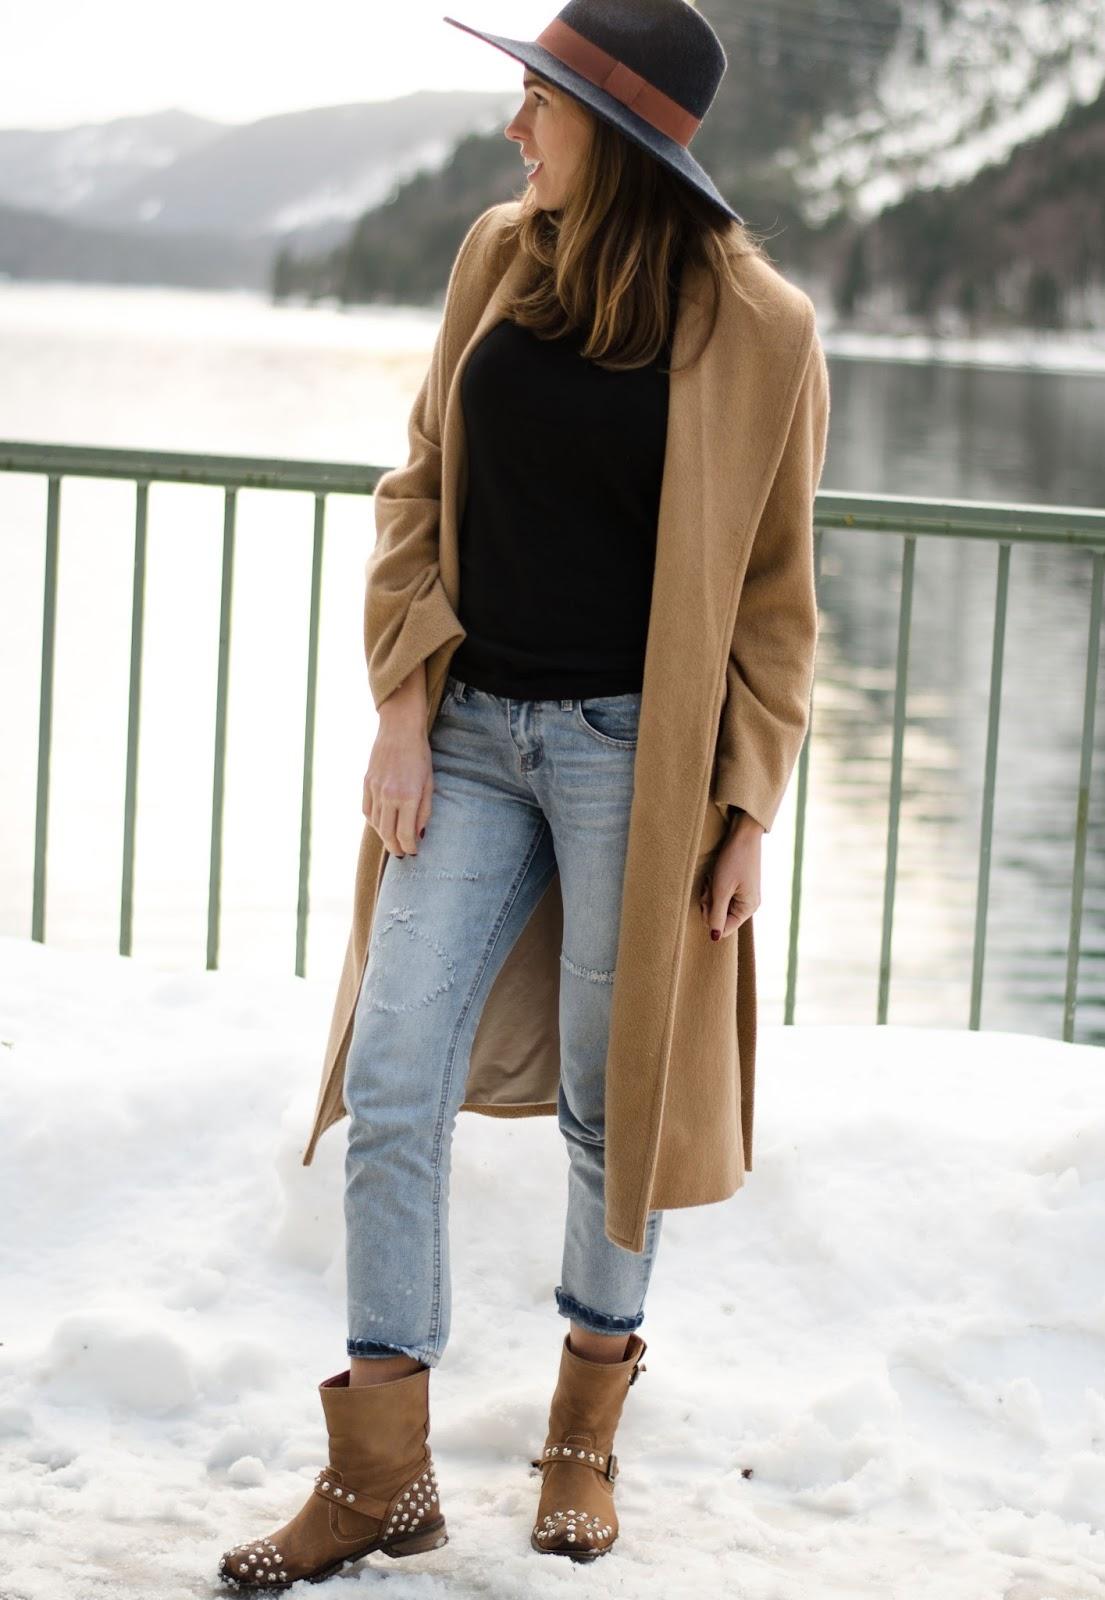 kristjaana mere minimal casual winter outfit camel coat boyfriend jeans